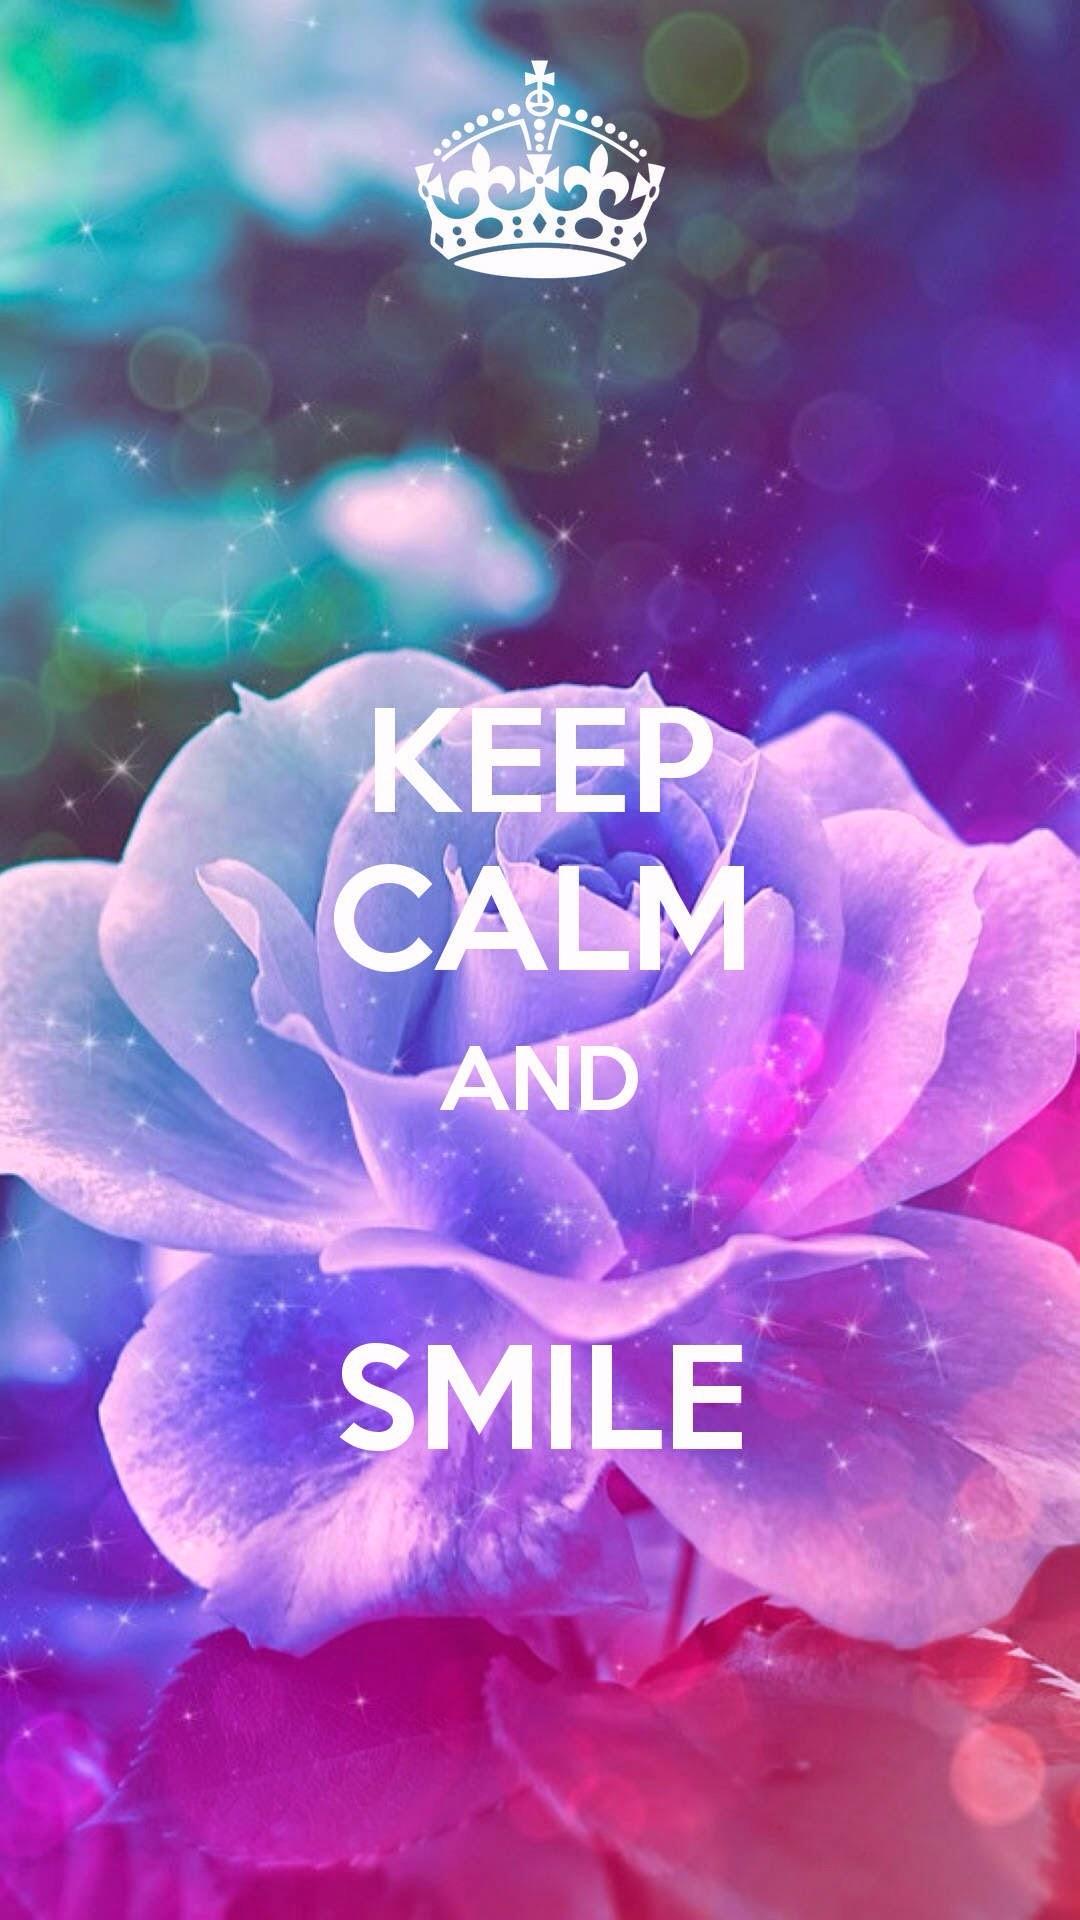 1080x1920 Keep Calm And Smile